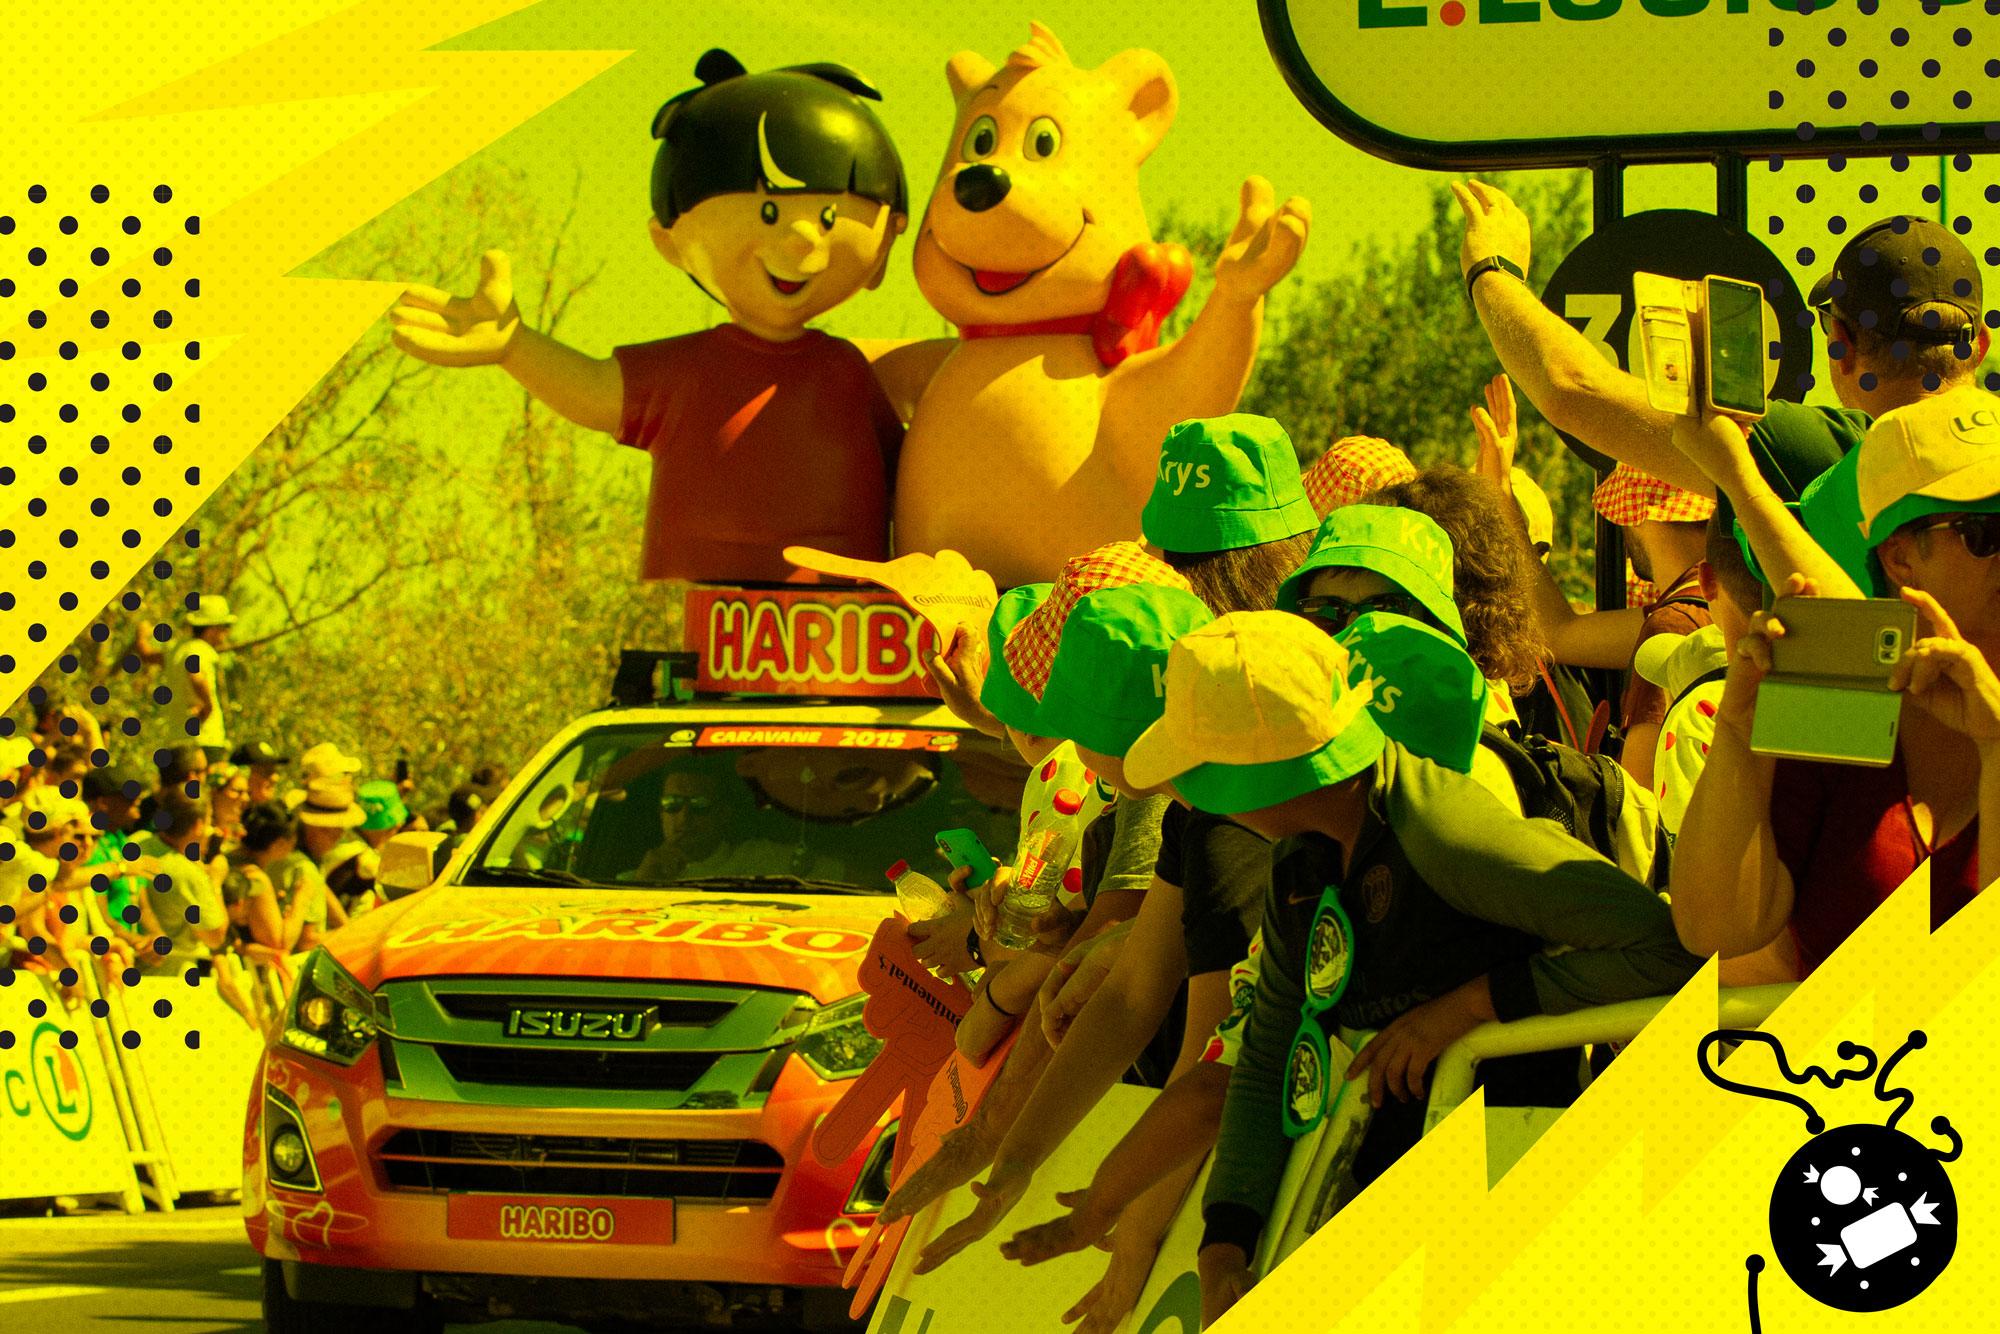 The Tour de France's weirdest tradition is a high-speed, candy-chucking parade